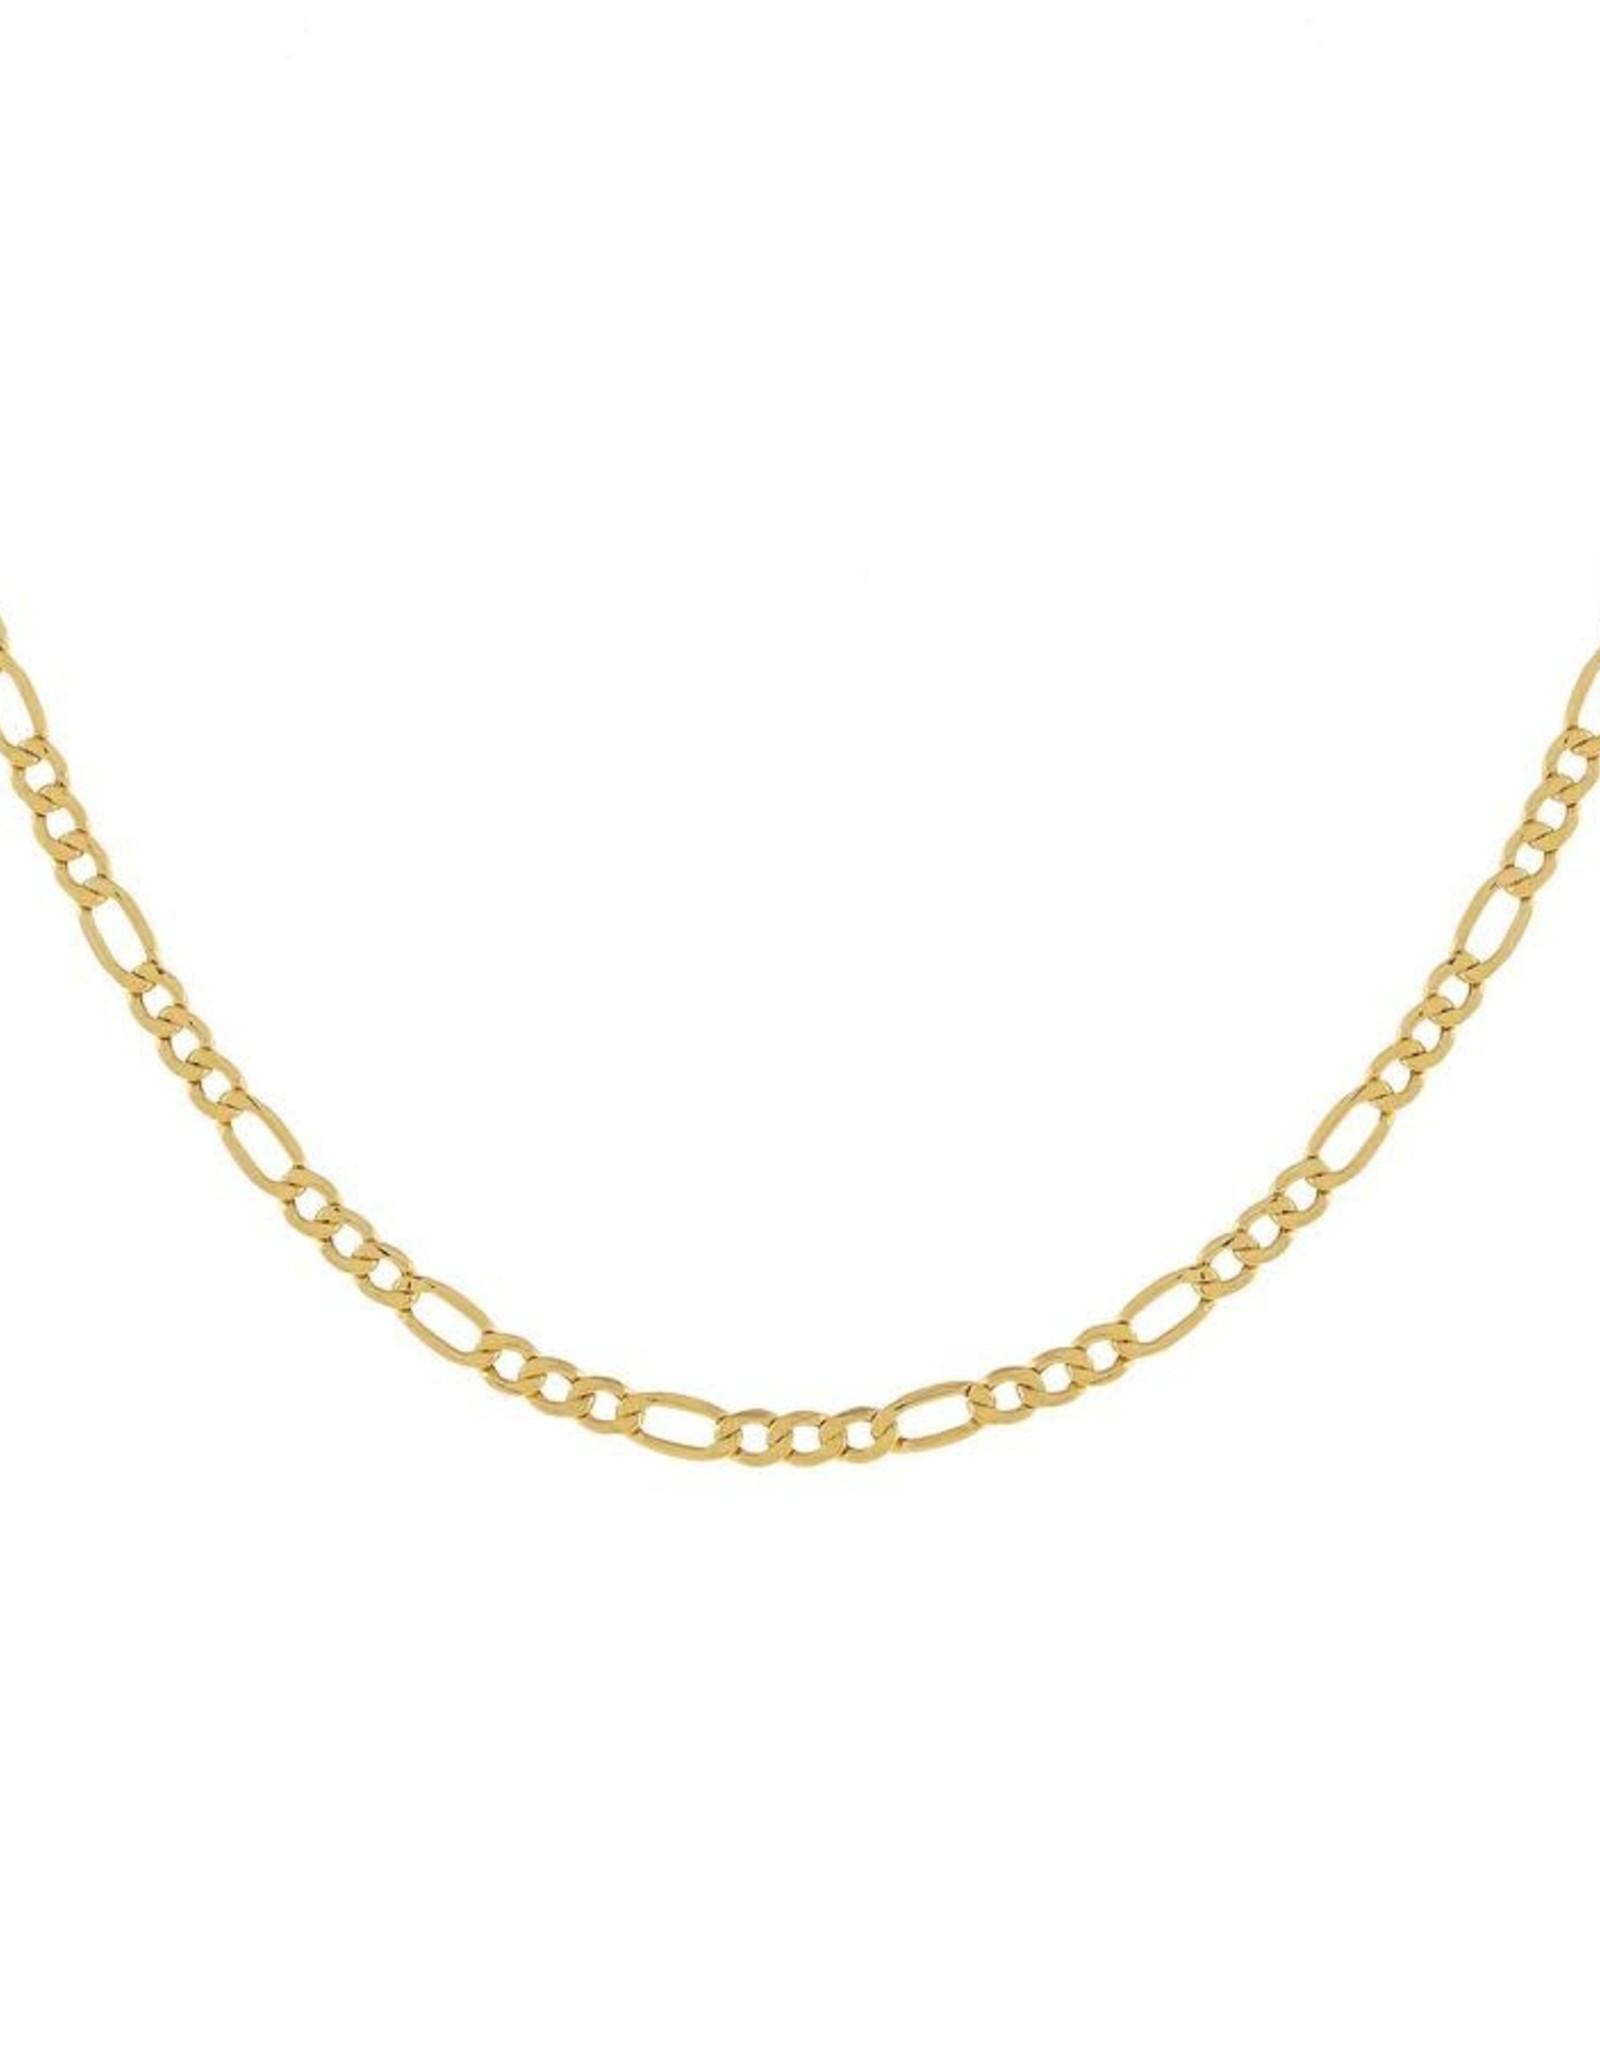 Adinas Figaro Necklace 16in 14K